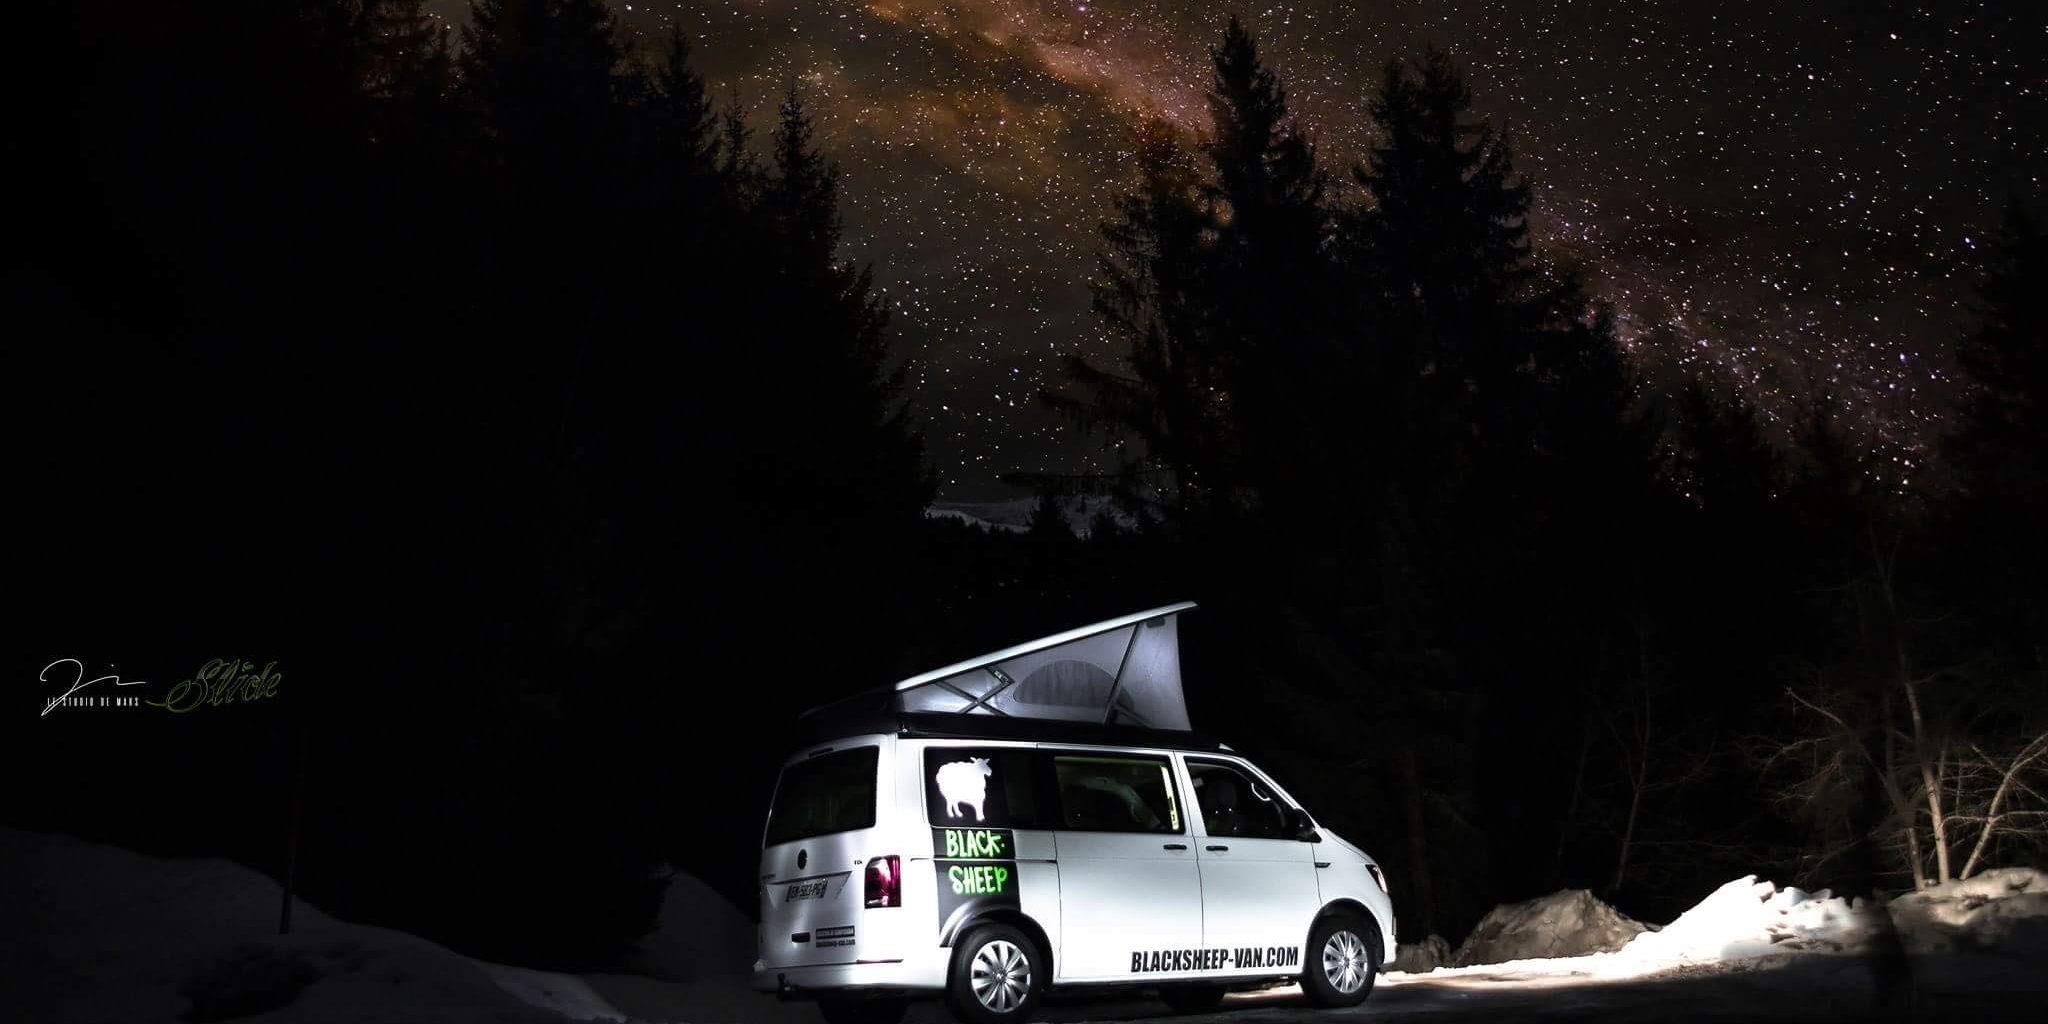 Corsica Frankrijk campervans Blacksheep CALIFORNIA BLACKSHEEP slaapcabine natuur bomen sterrenhemel nacht